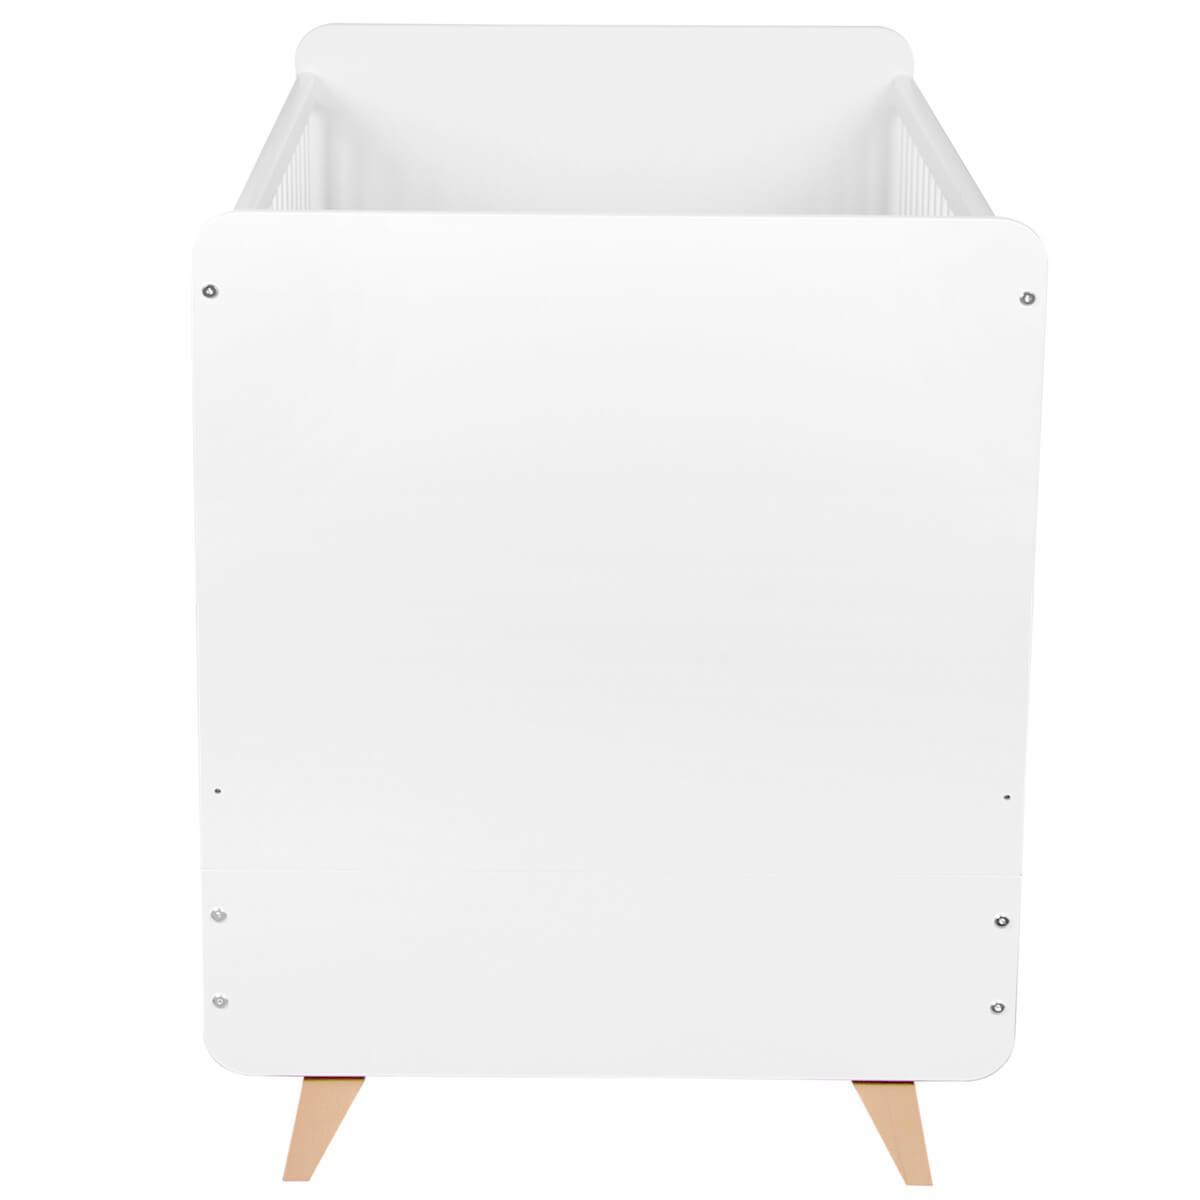 Cuna evolutiva 70x140cm LOFT Quax blanco